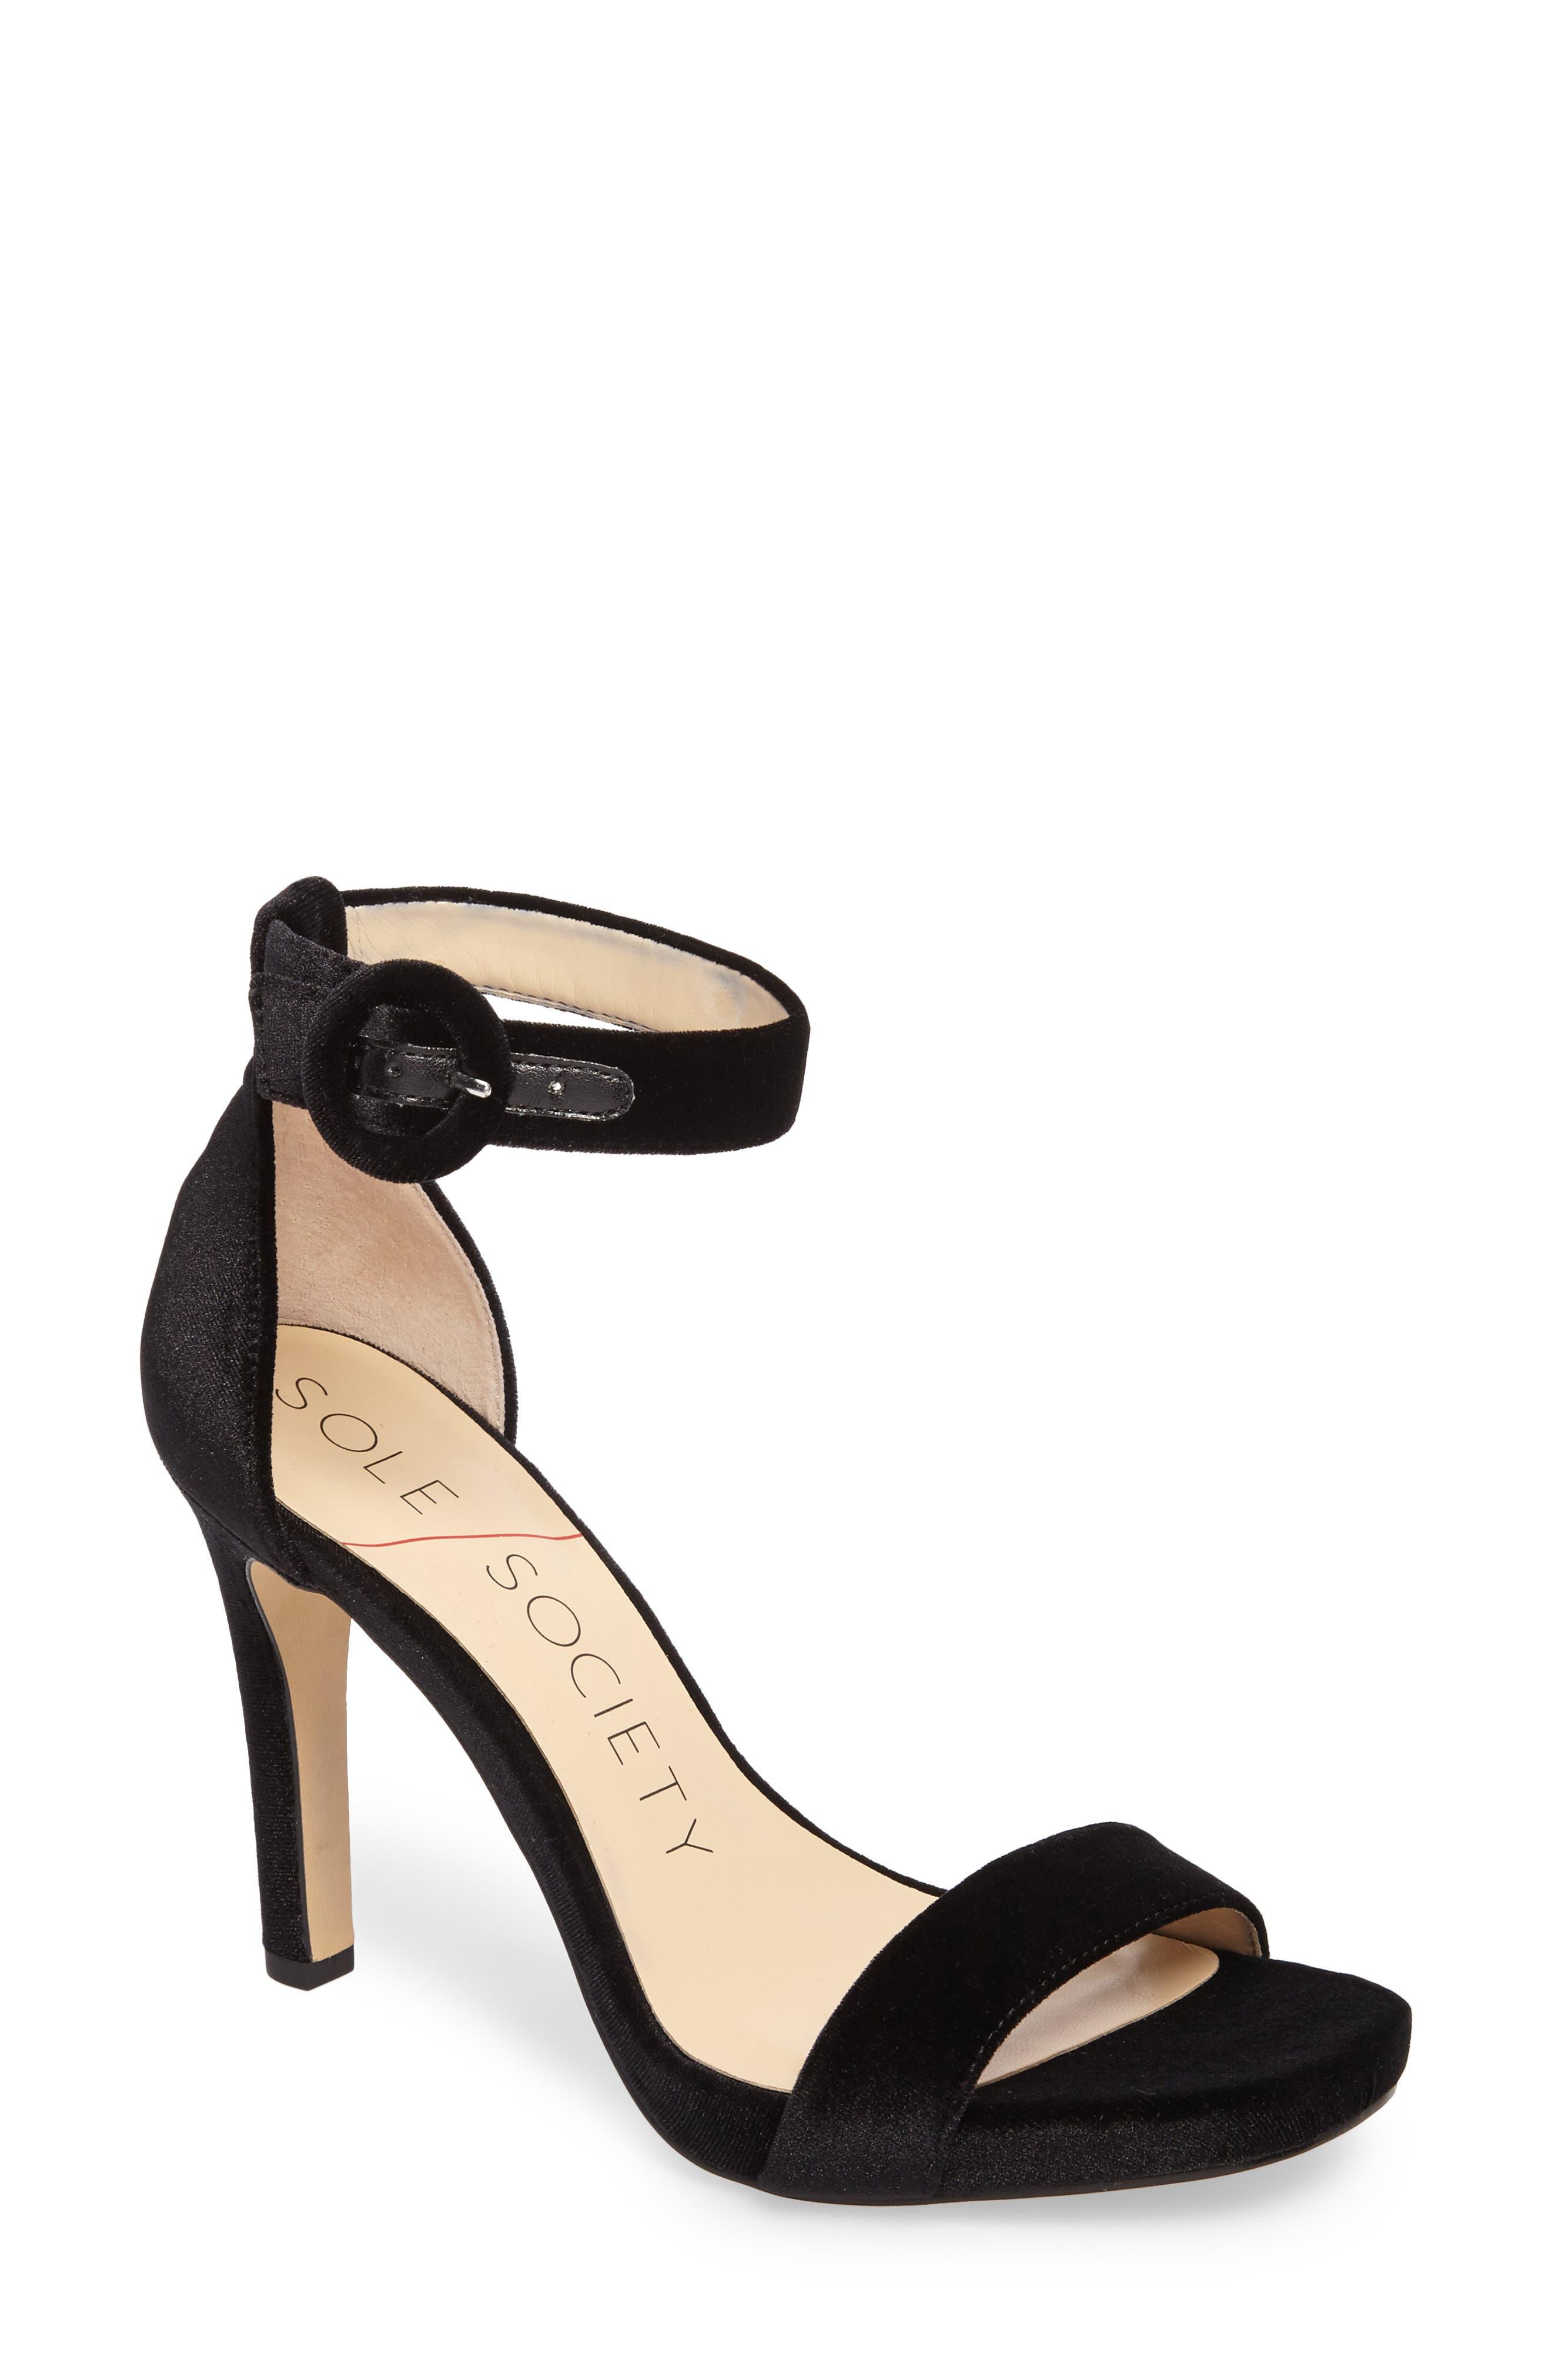 Emelia Ankle Strap Sandal,                             Main thumbnail 1, color,                             001